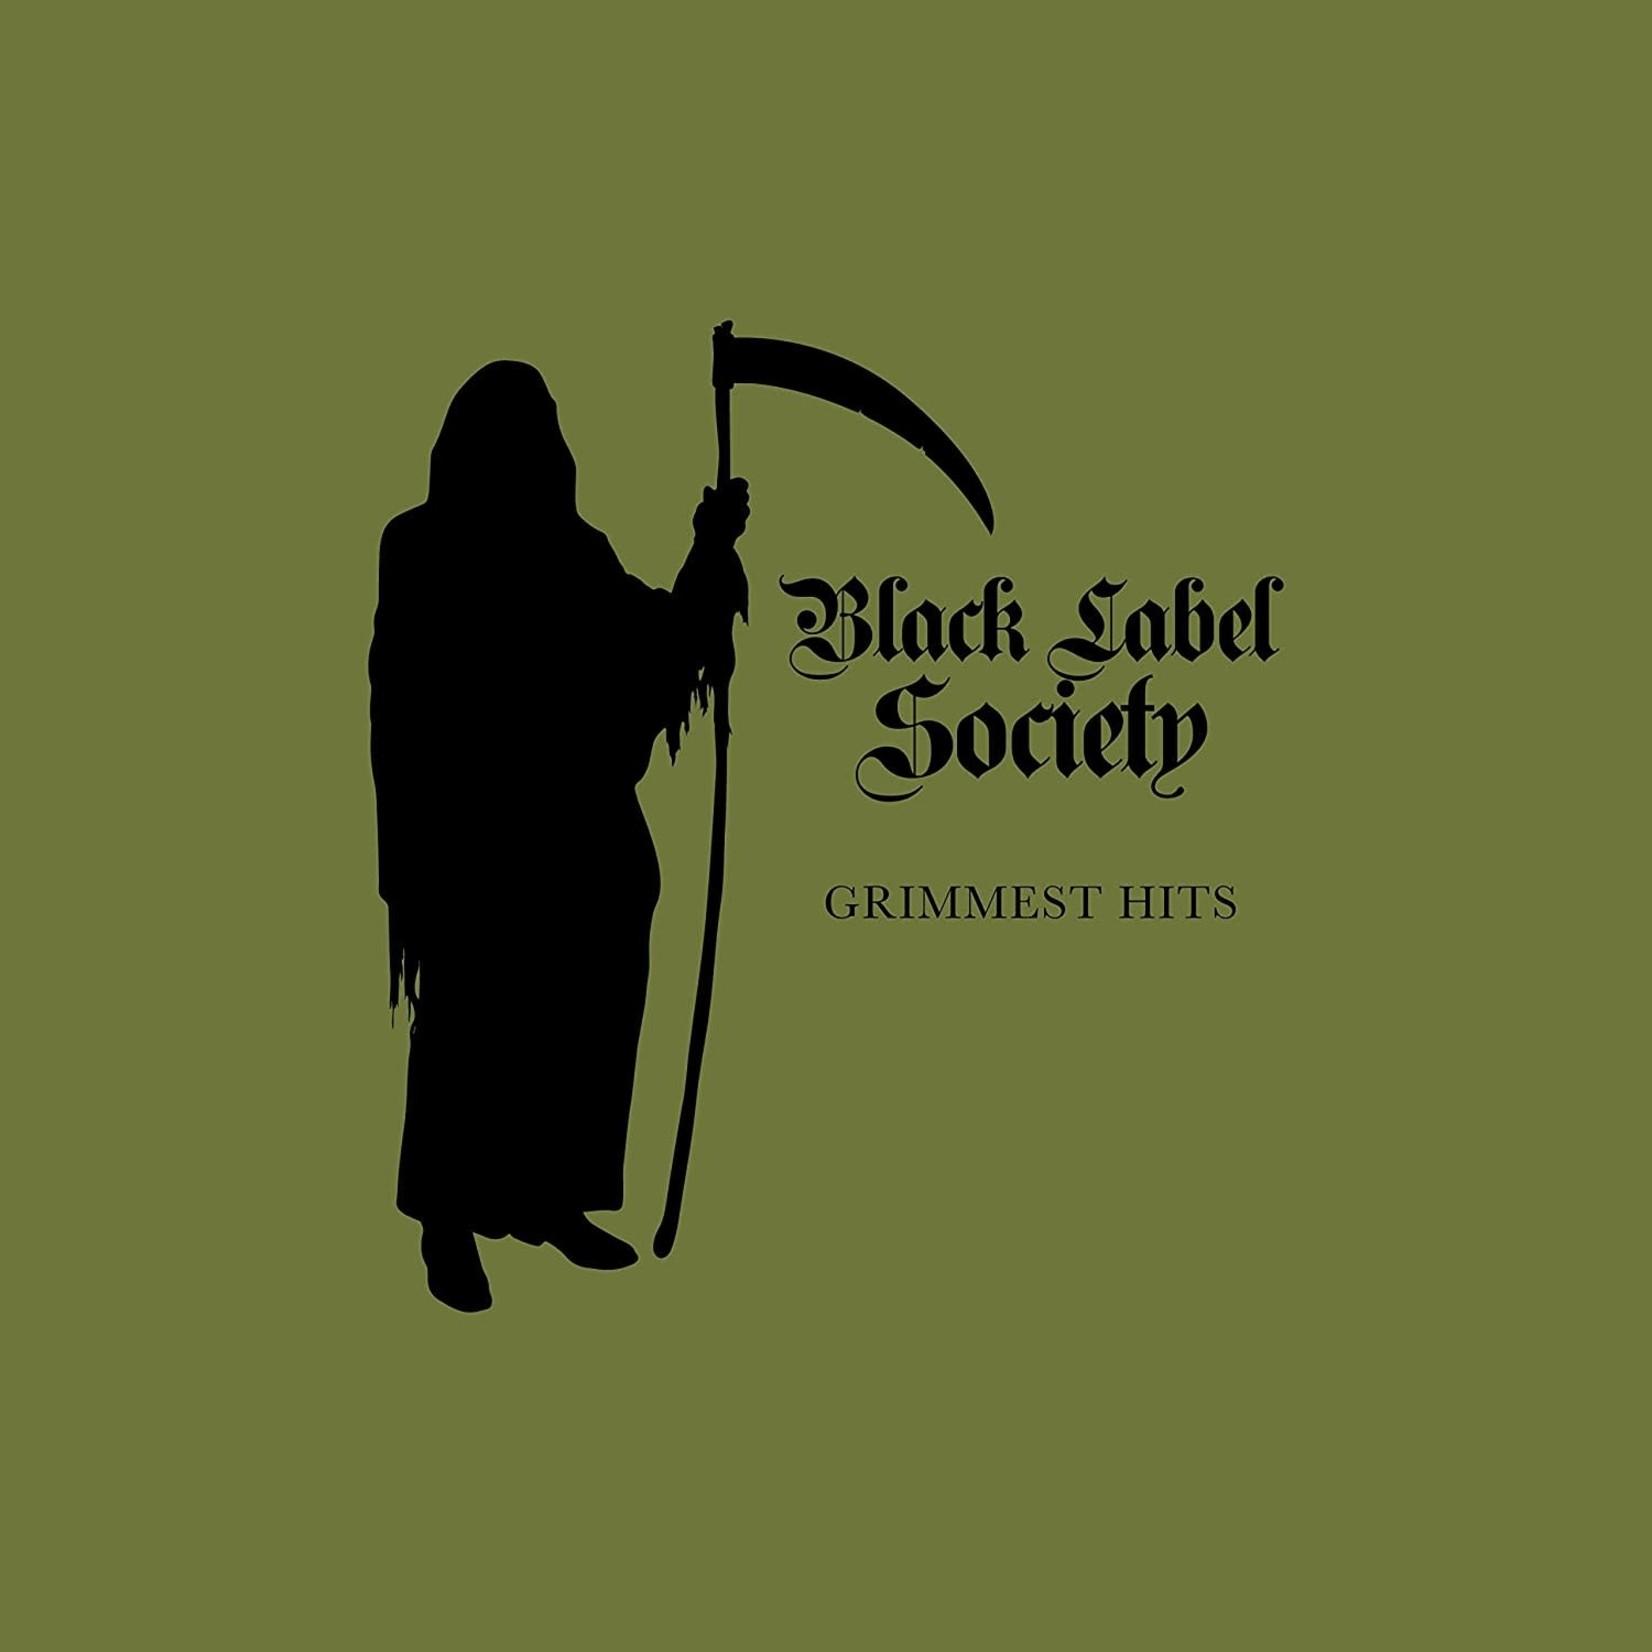 [New] Black Label Society: Grimmest Hits (2LP)